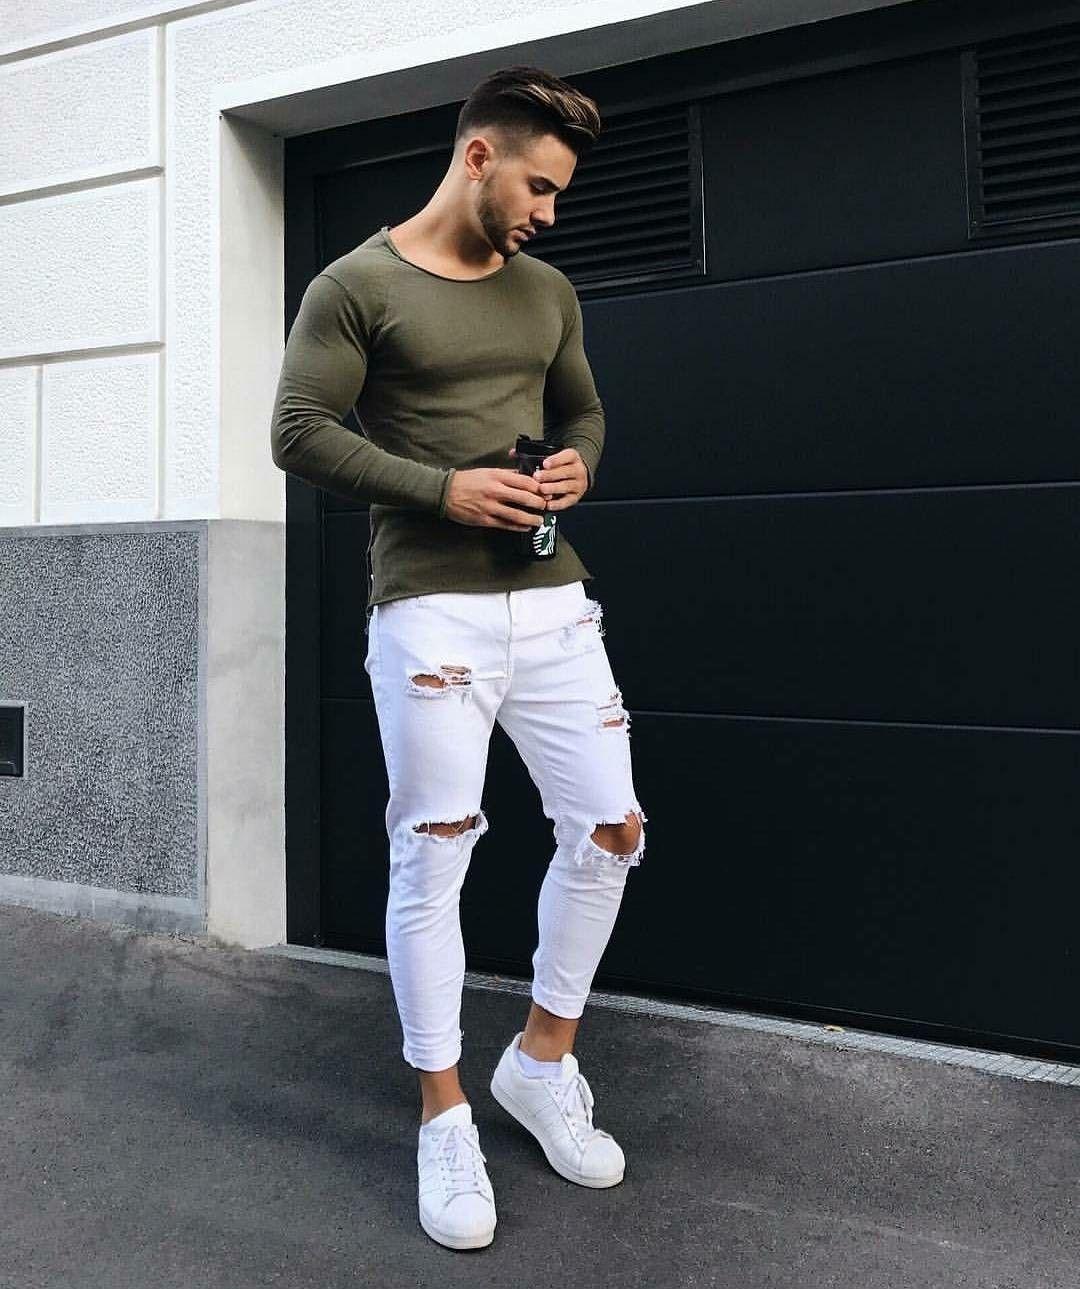 Men Style Fashion Look Clothing Clothes Man Ropa Moda Para Hombres Outfit Models Moda Masculina Estilo De Ropa Hombre Moda Casual Hombre Moda Masculina Urbana